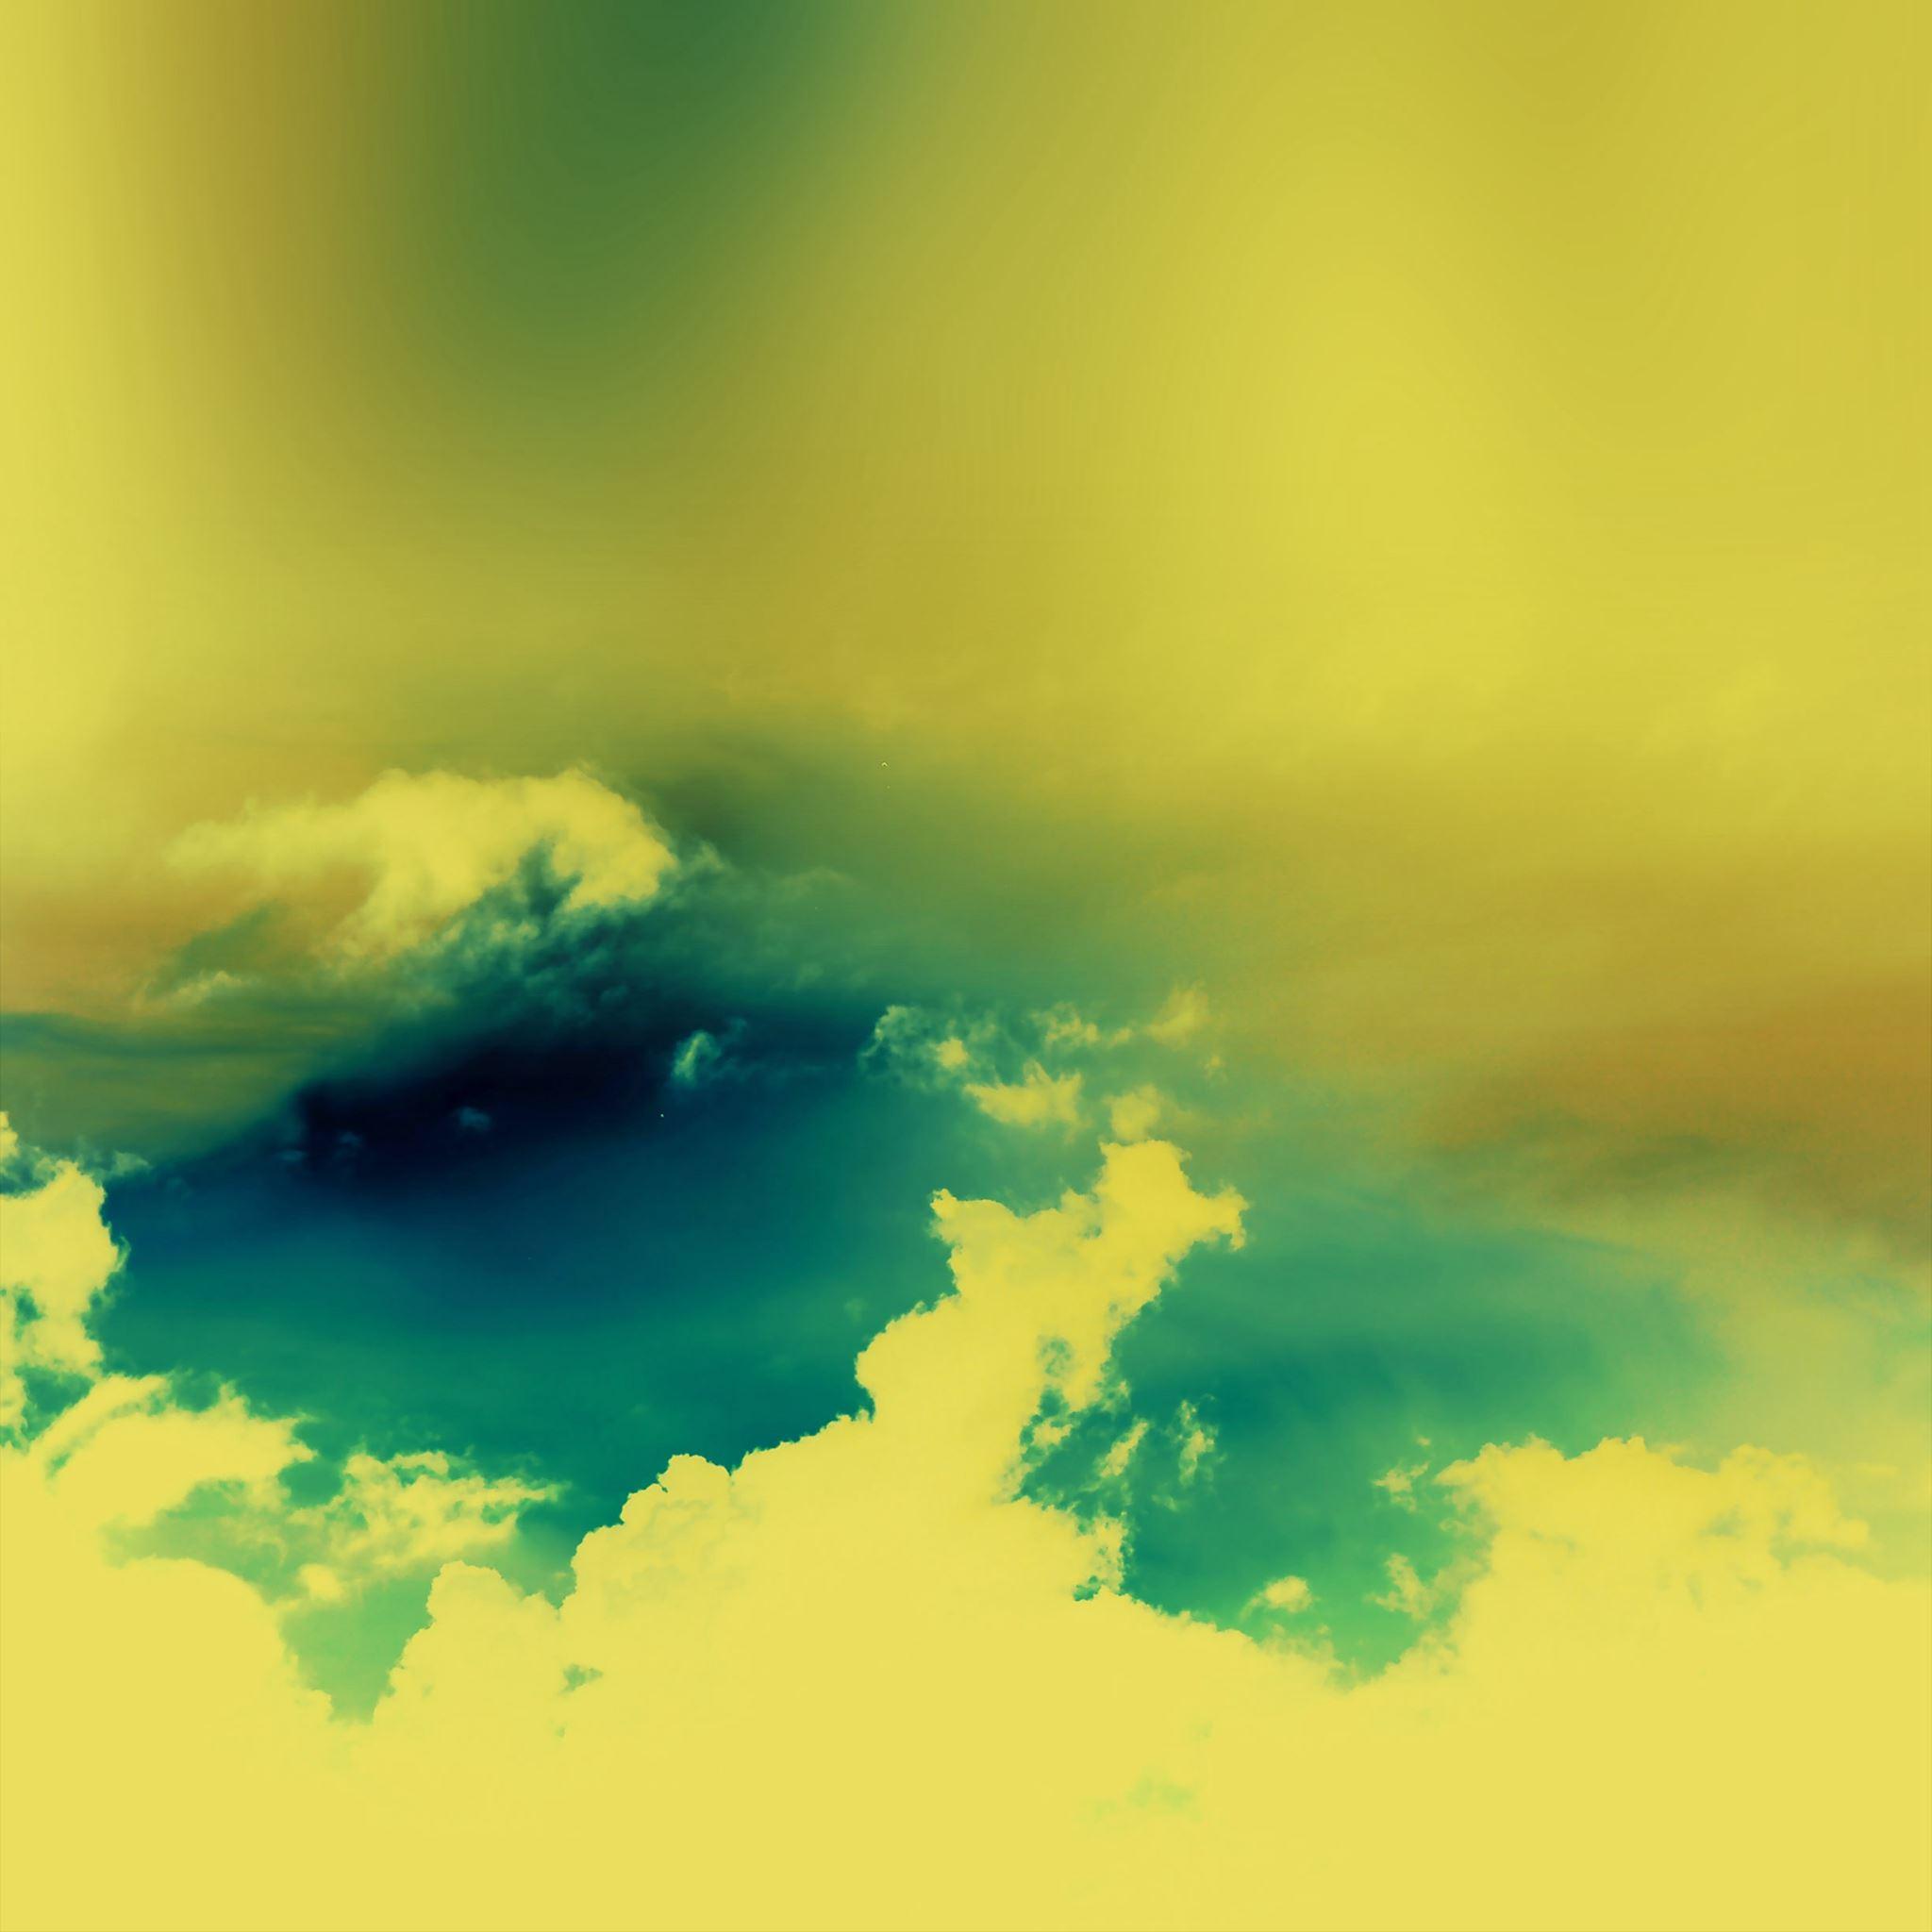 Sunny Cloudy Sky In Colors iPad Air wallpaper